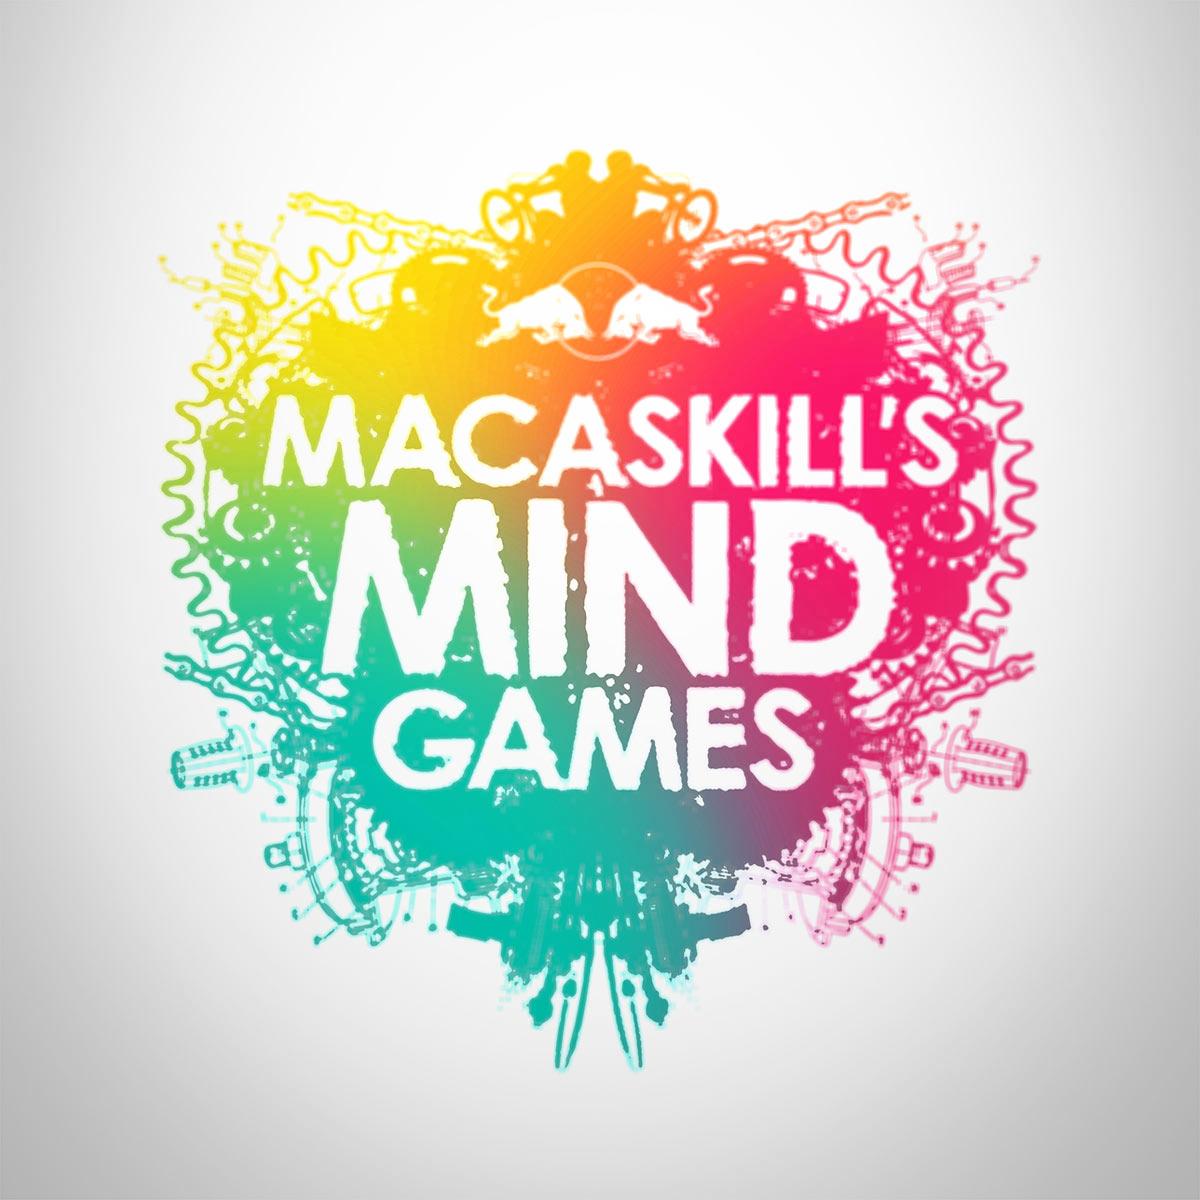 Red Bull   Macaskills Mind Games   Event Logo